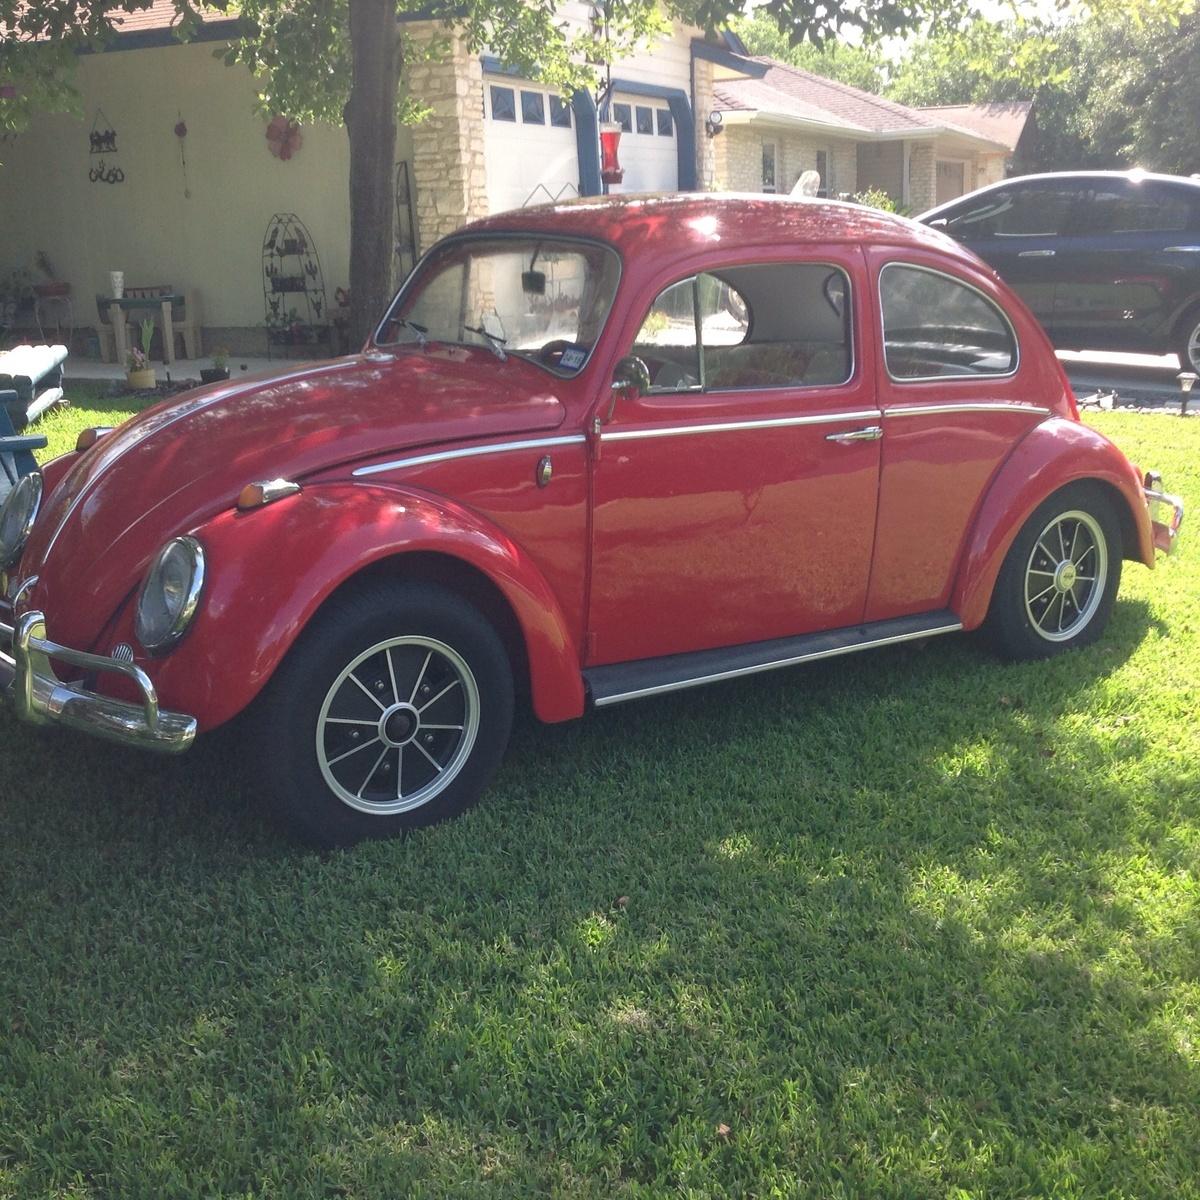 teaser carcostcanada news volkswagen road alt vw bugs classic test review beetle